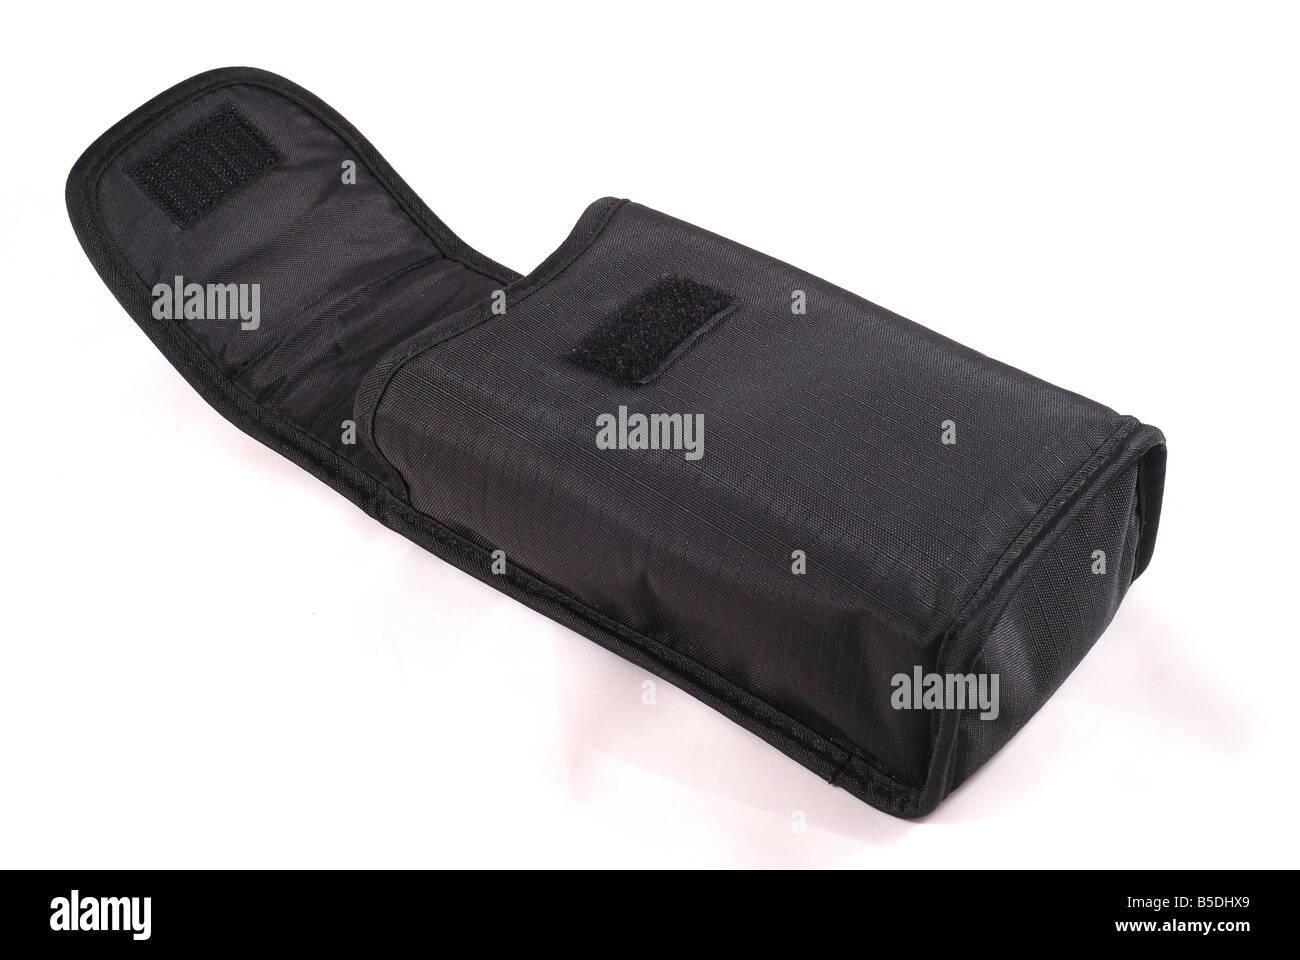 Nikon SB800 flashgun case - Stock Image